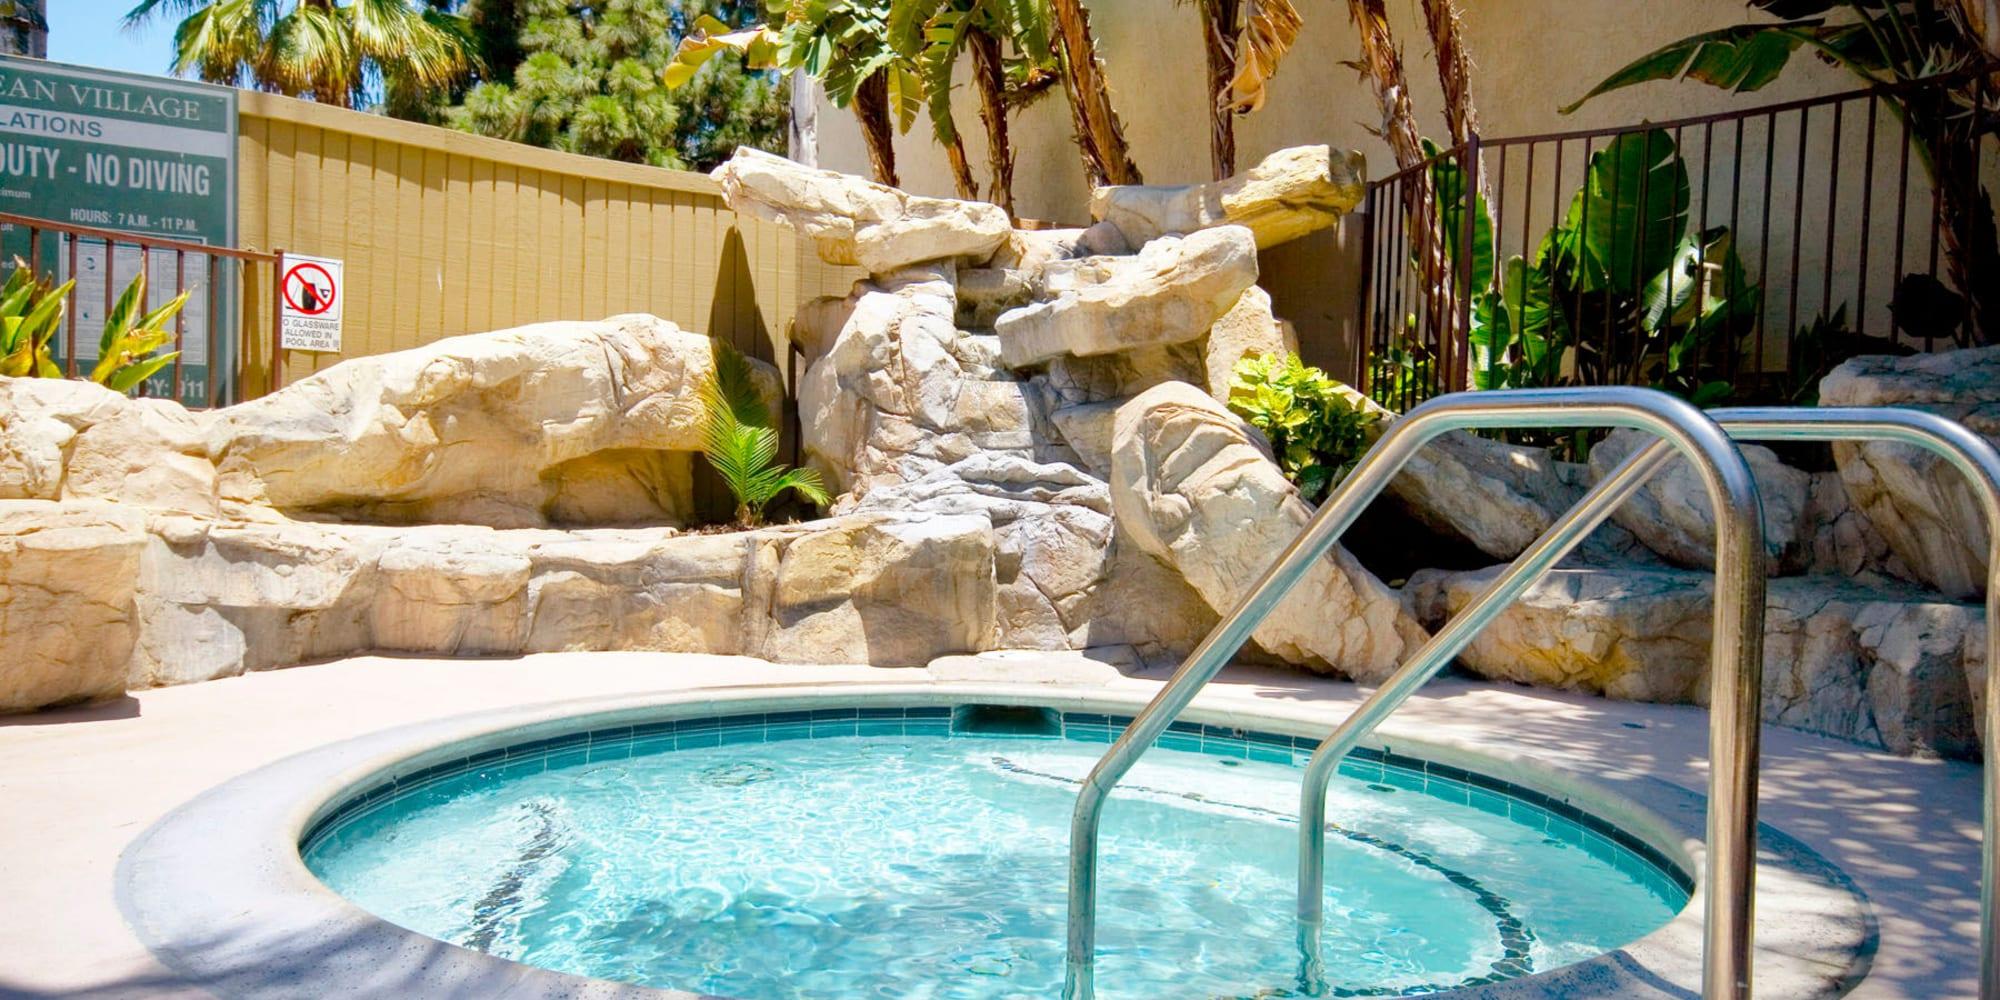 Spa area at Mediterranean Village Apartments in Costa Mesa, California